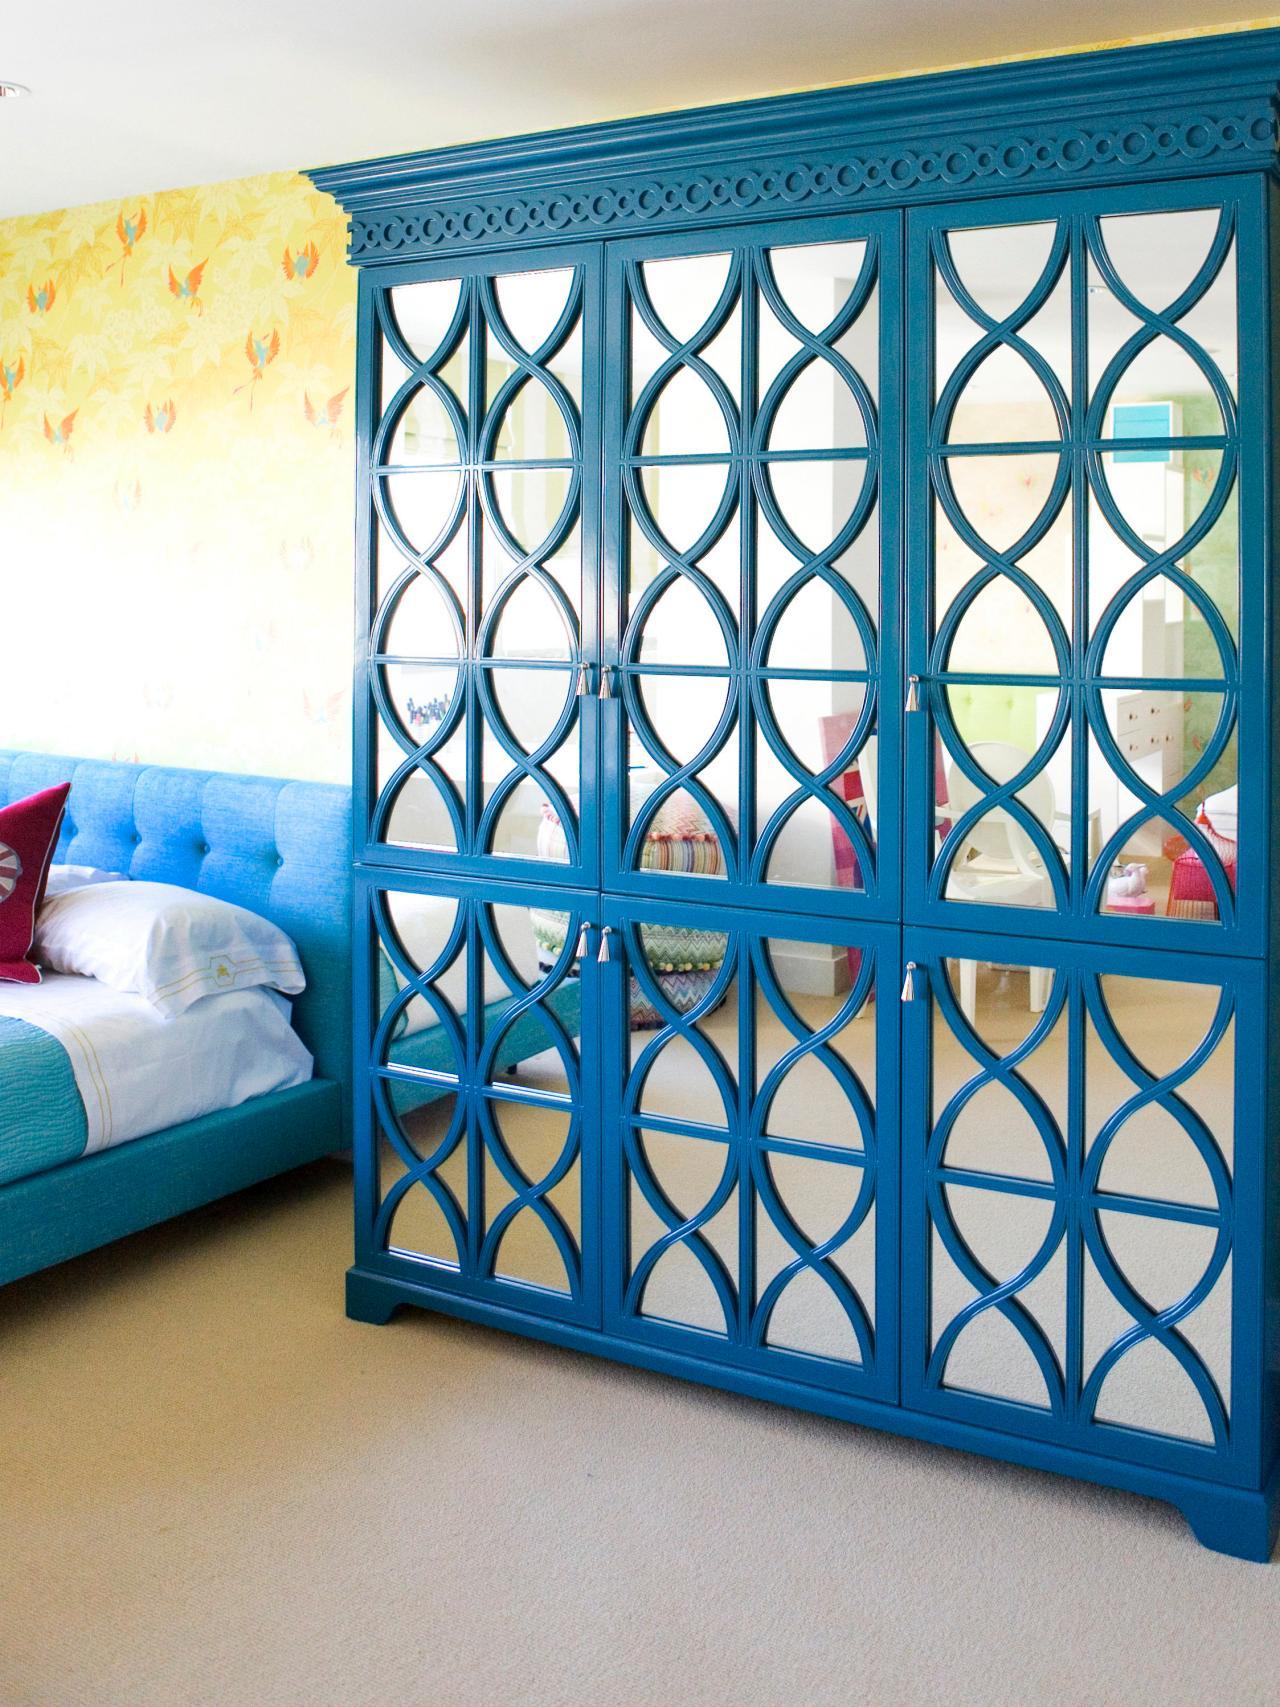 Chic Bedroom Storage